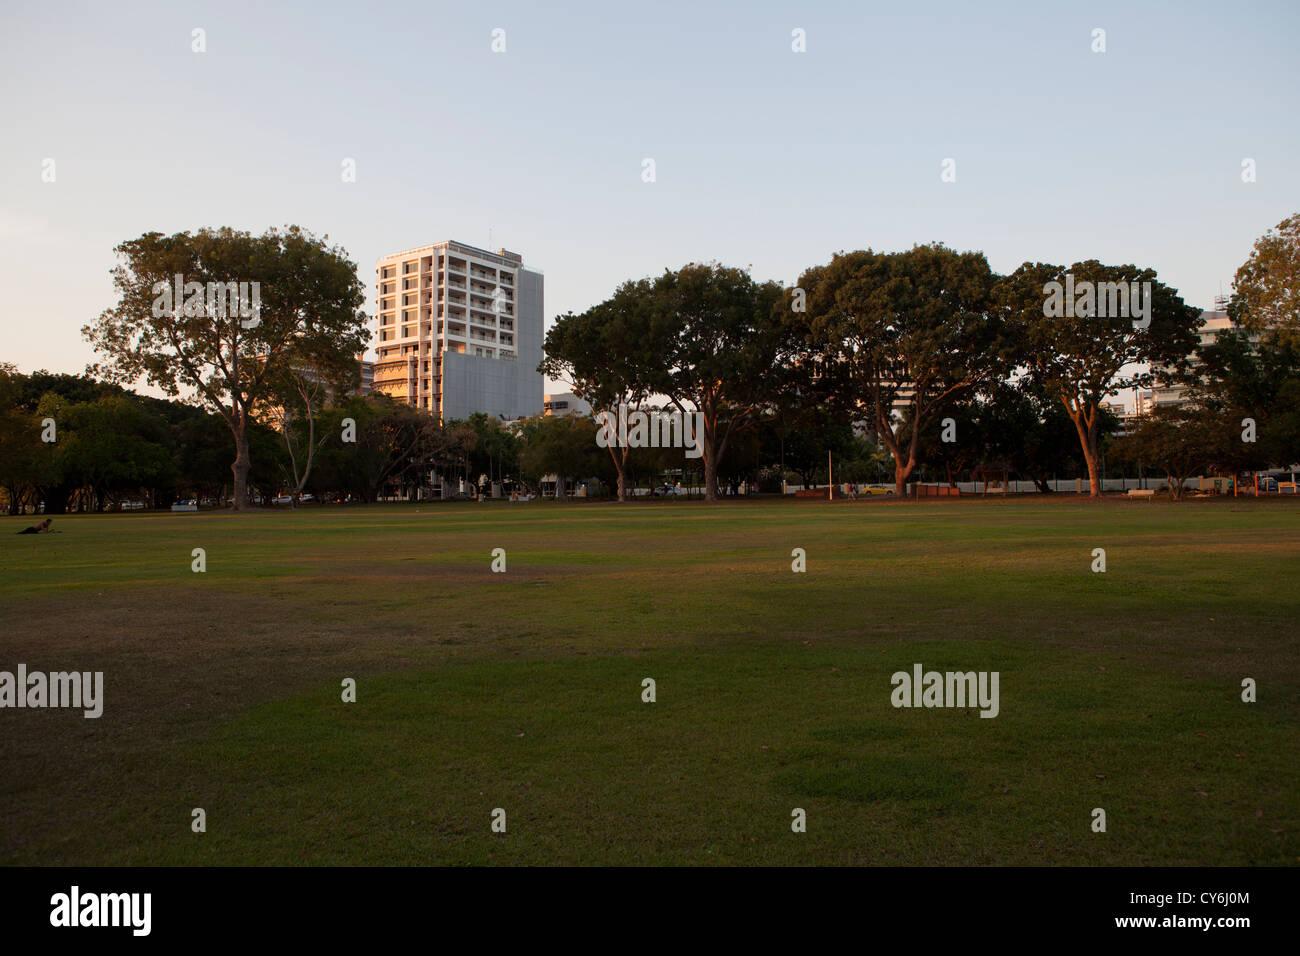 Bicentennial Park in Darwin, Northern Territory, Australia. - Stock Image